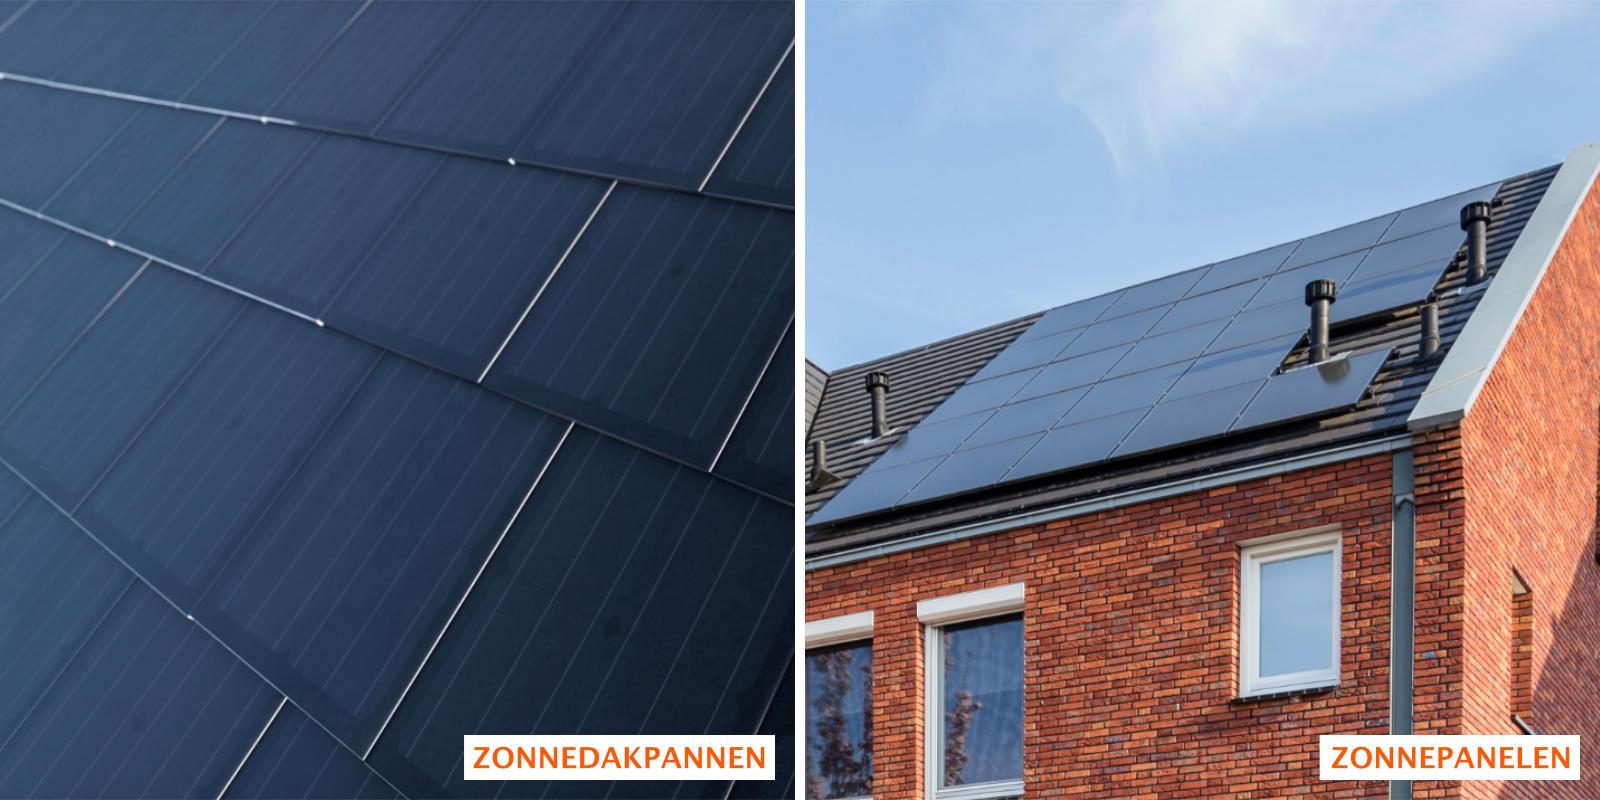 verschil zonnedakpannen en zonnepanelen